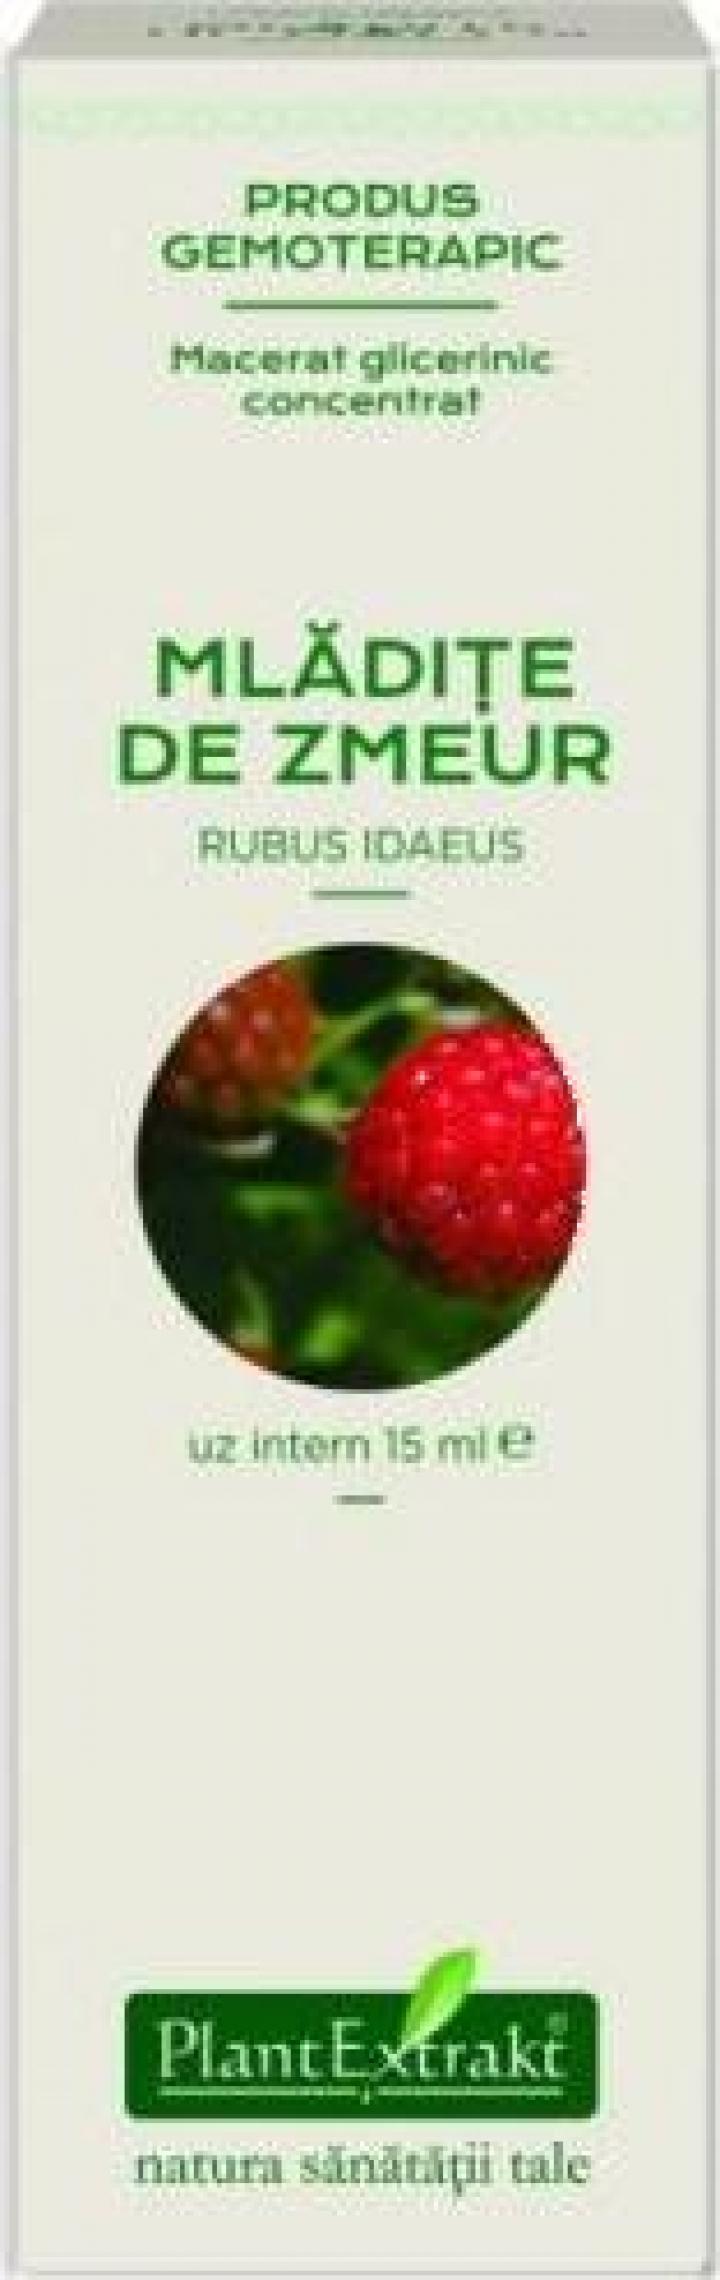 Extract concentrat din mladite de zmeur (Rubus Idaeus)